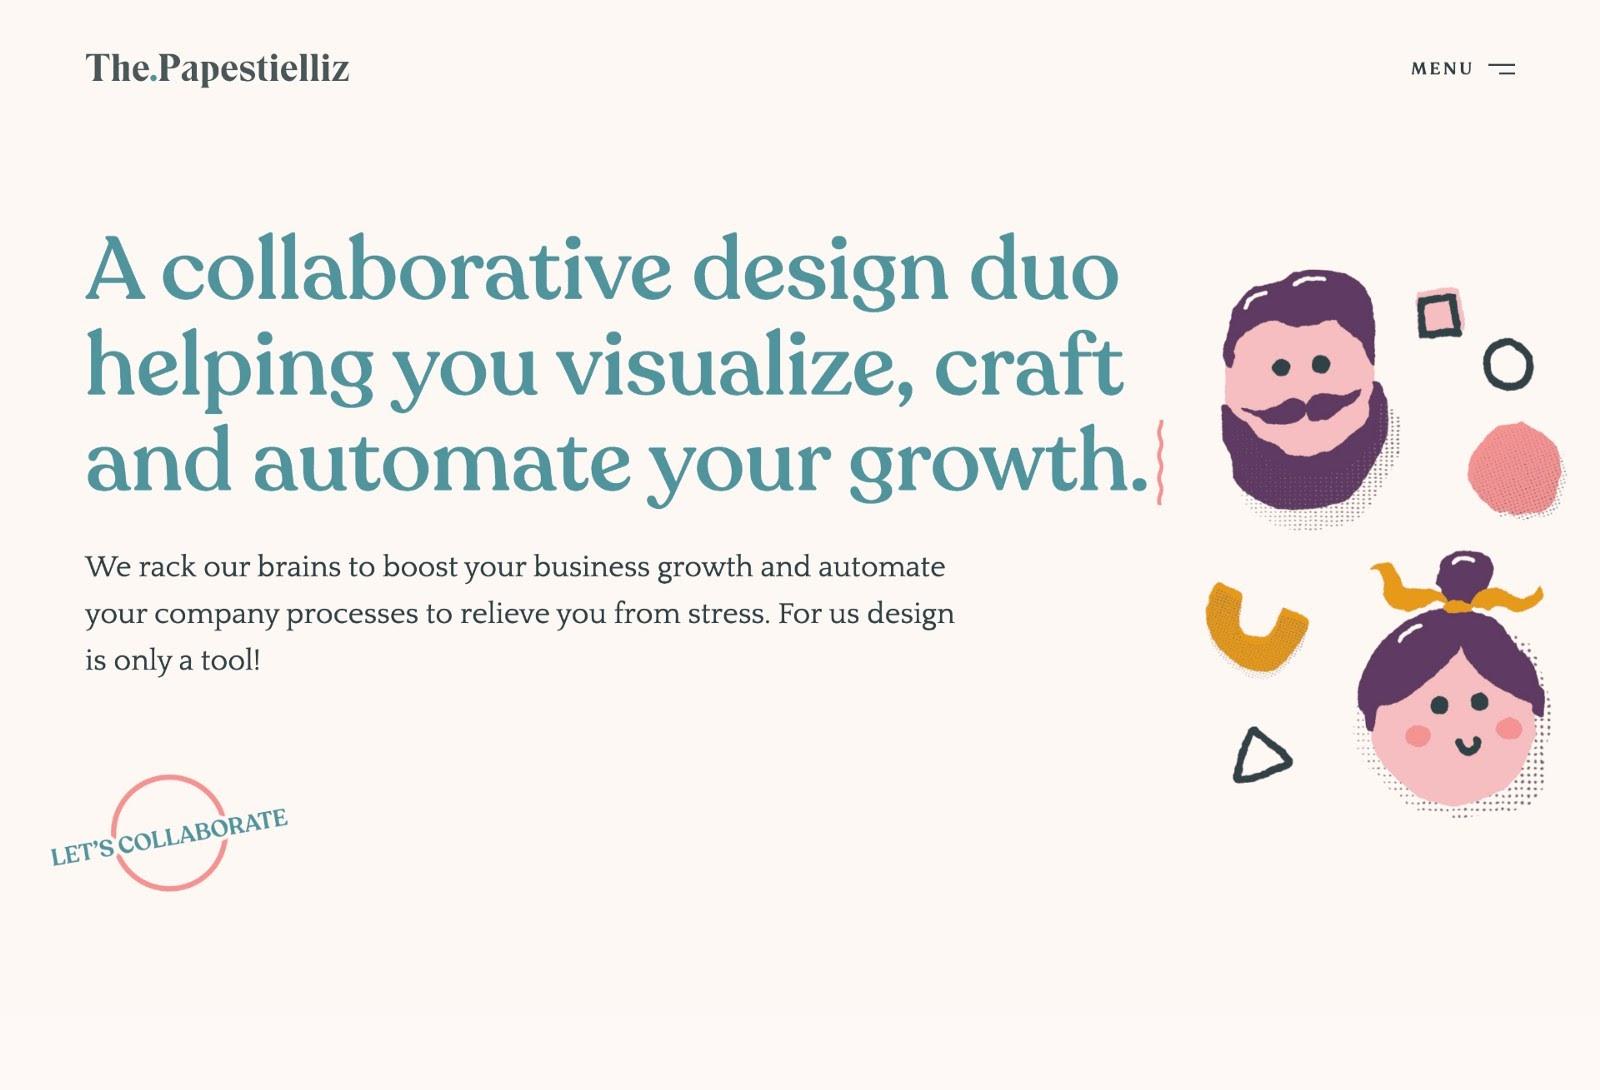 Portfolio website example (source: The.Papestielliz)